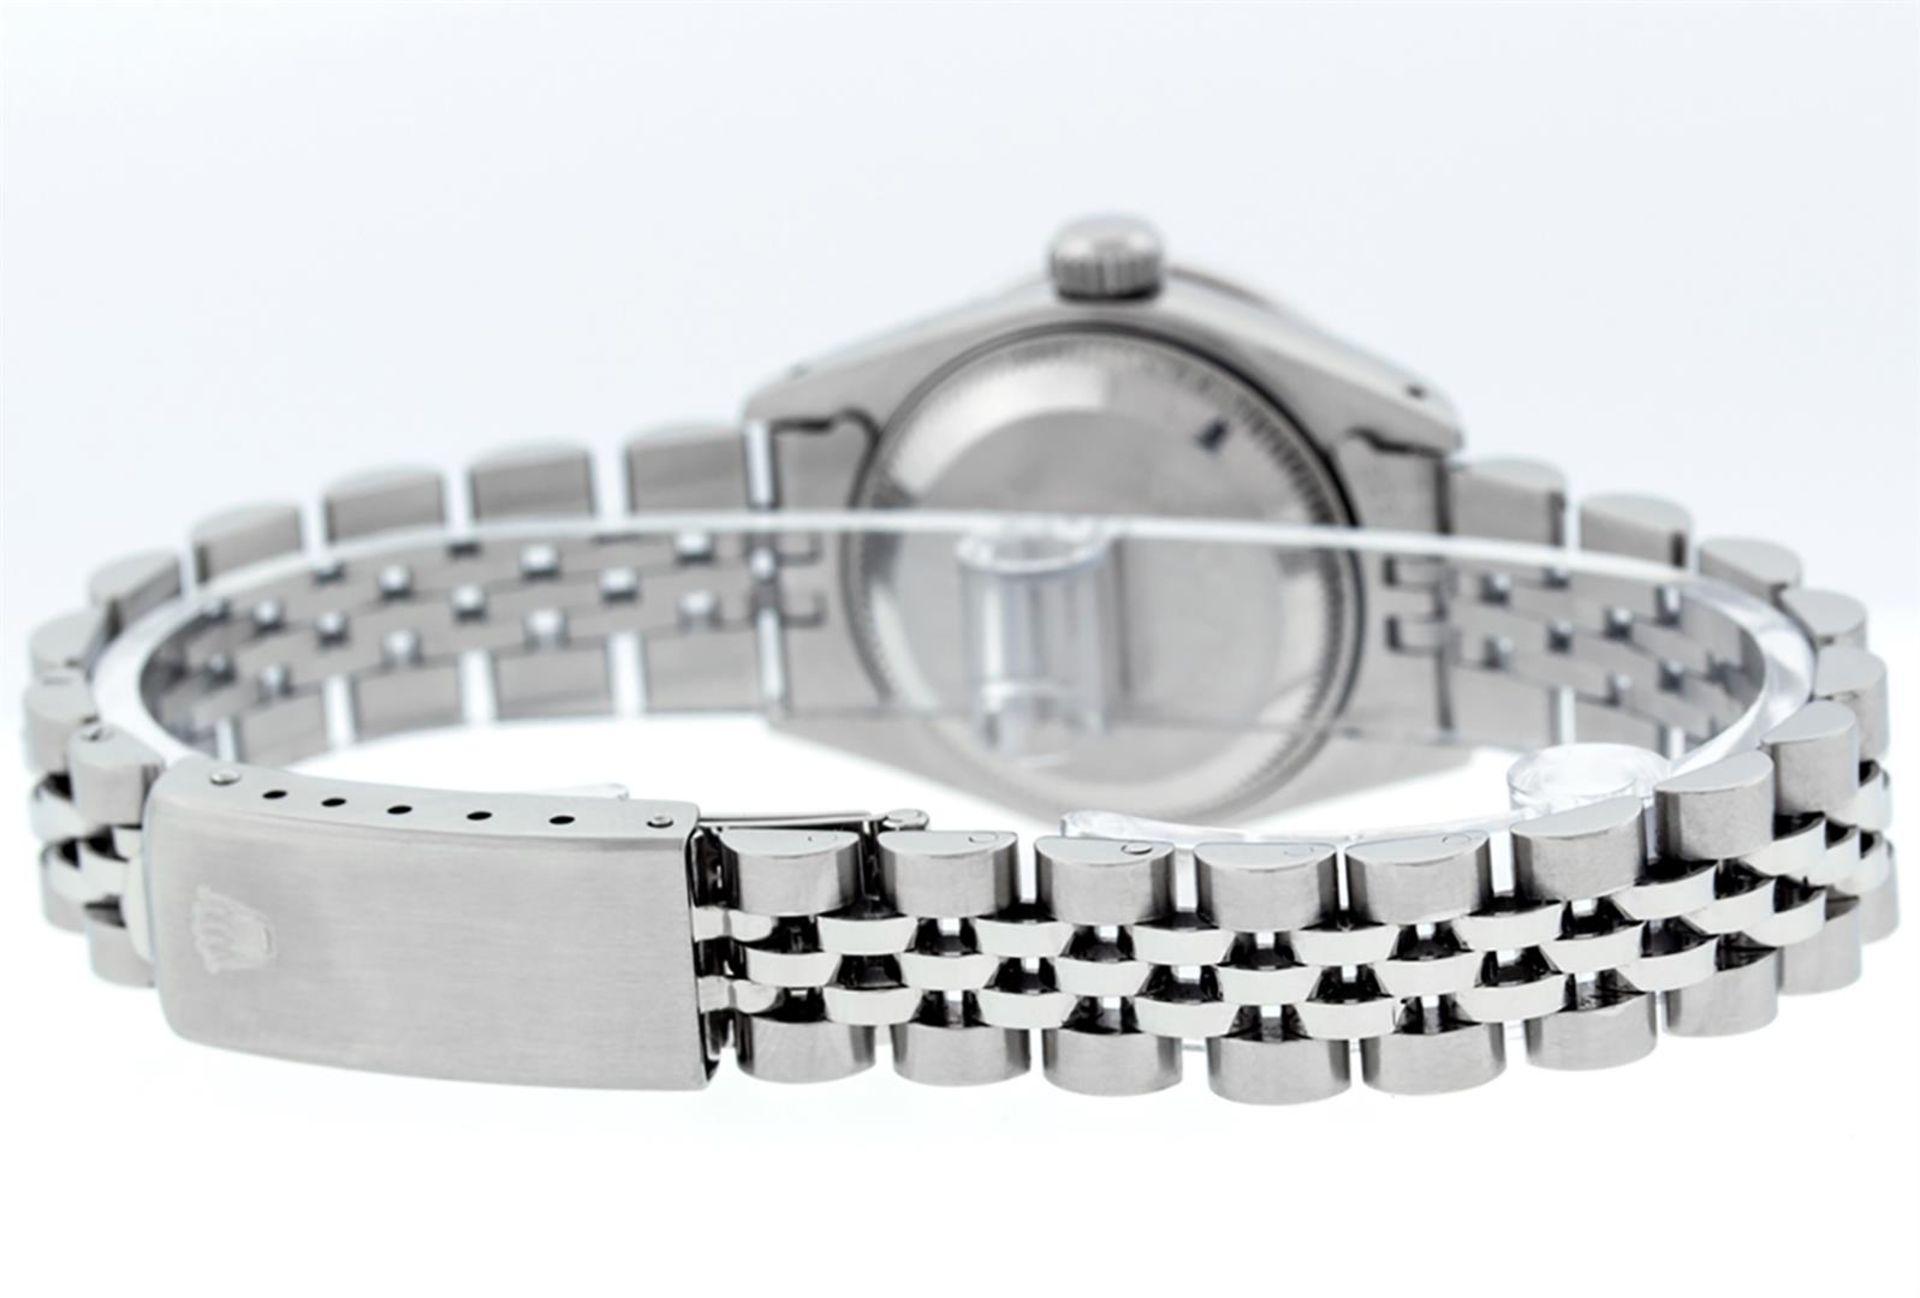 Rolex Ladies Stainless Steel 26MM Purple String Diamond Lugs Datejust Wristwatch - Image 6 of 9